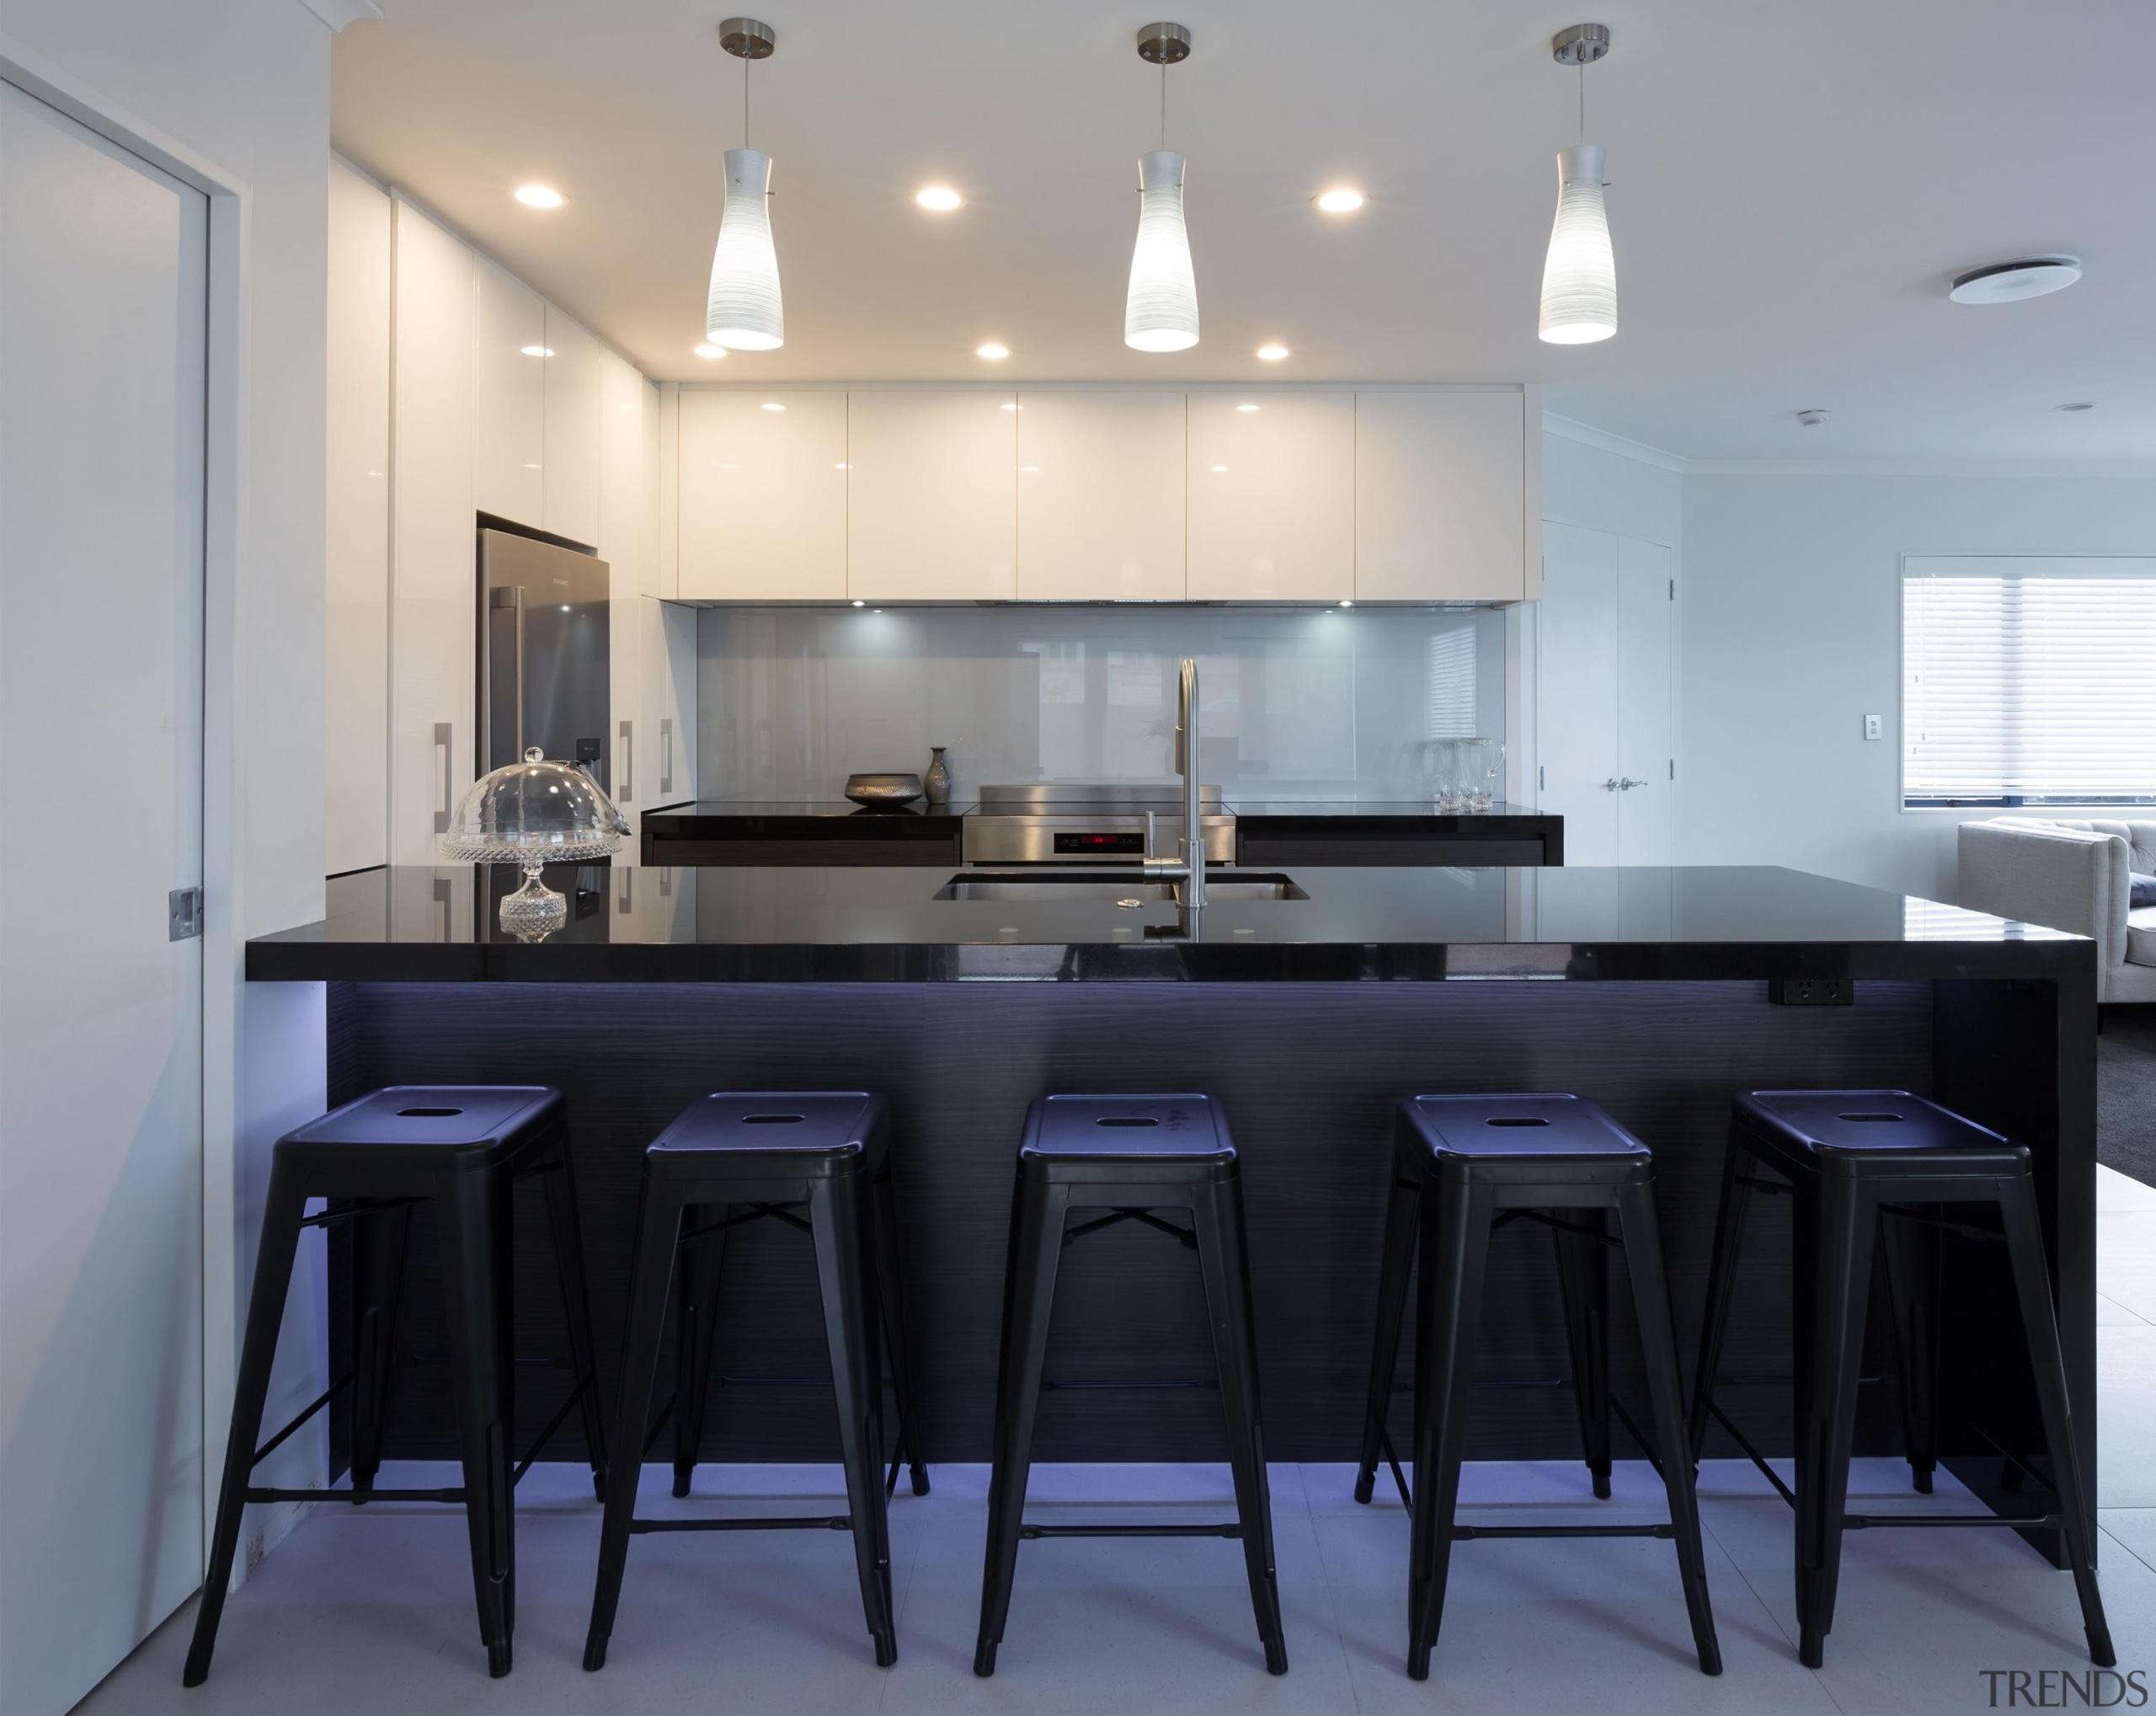 designatek gloss, designatek textured, profile handle, bar fridge, countertop, cuisine classique, interior design, kitchen, room, table, gray, black